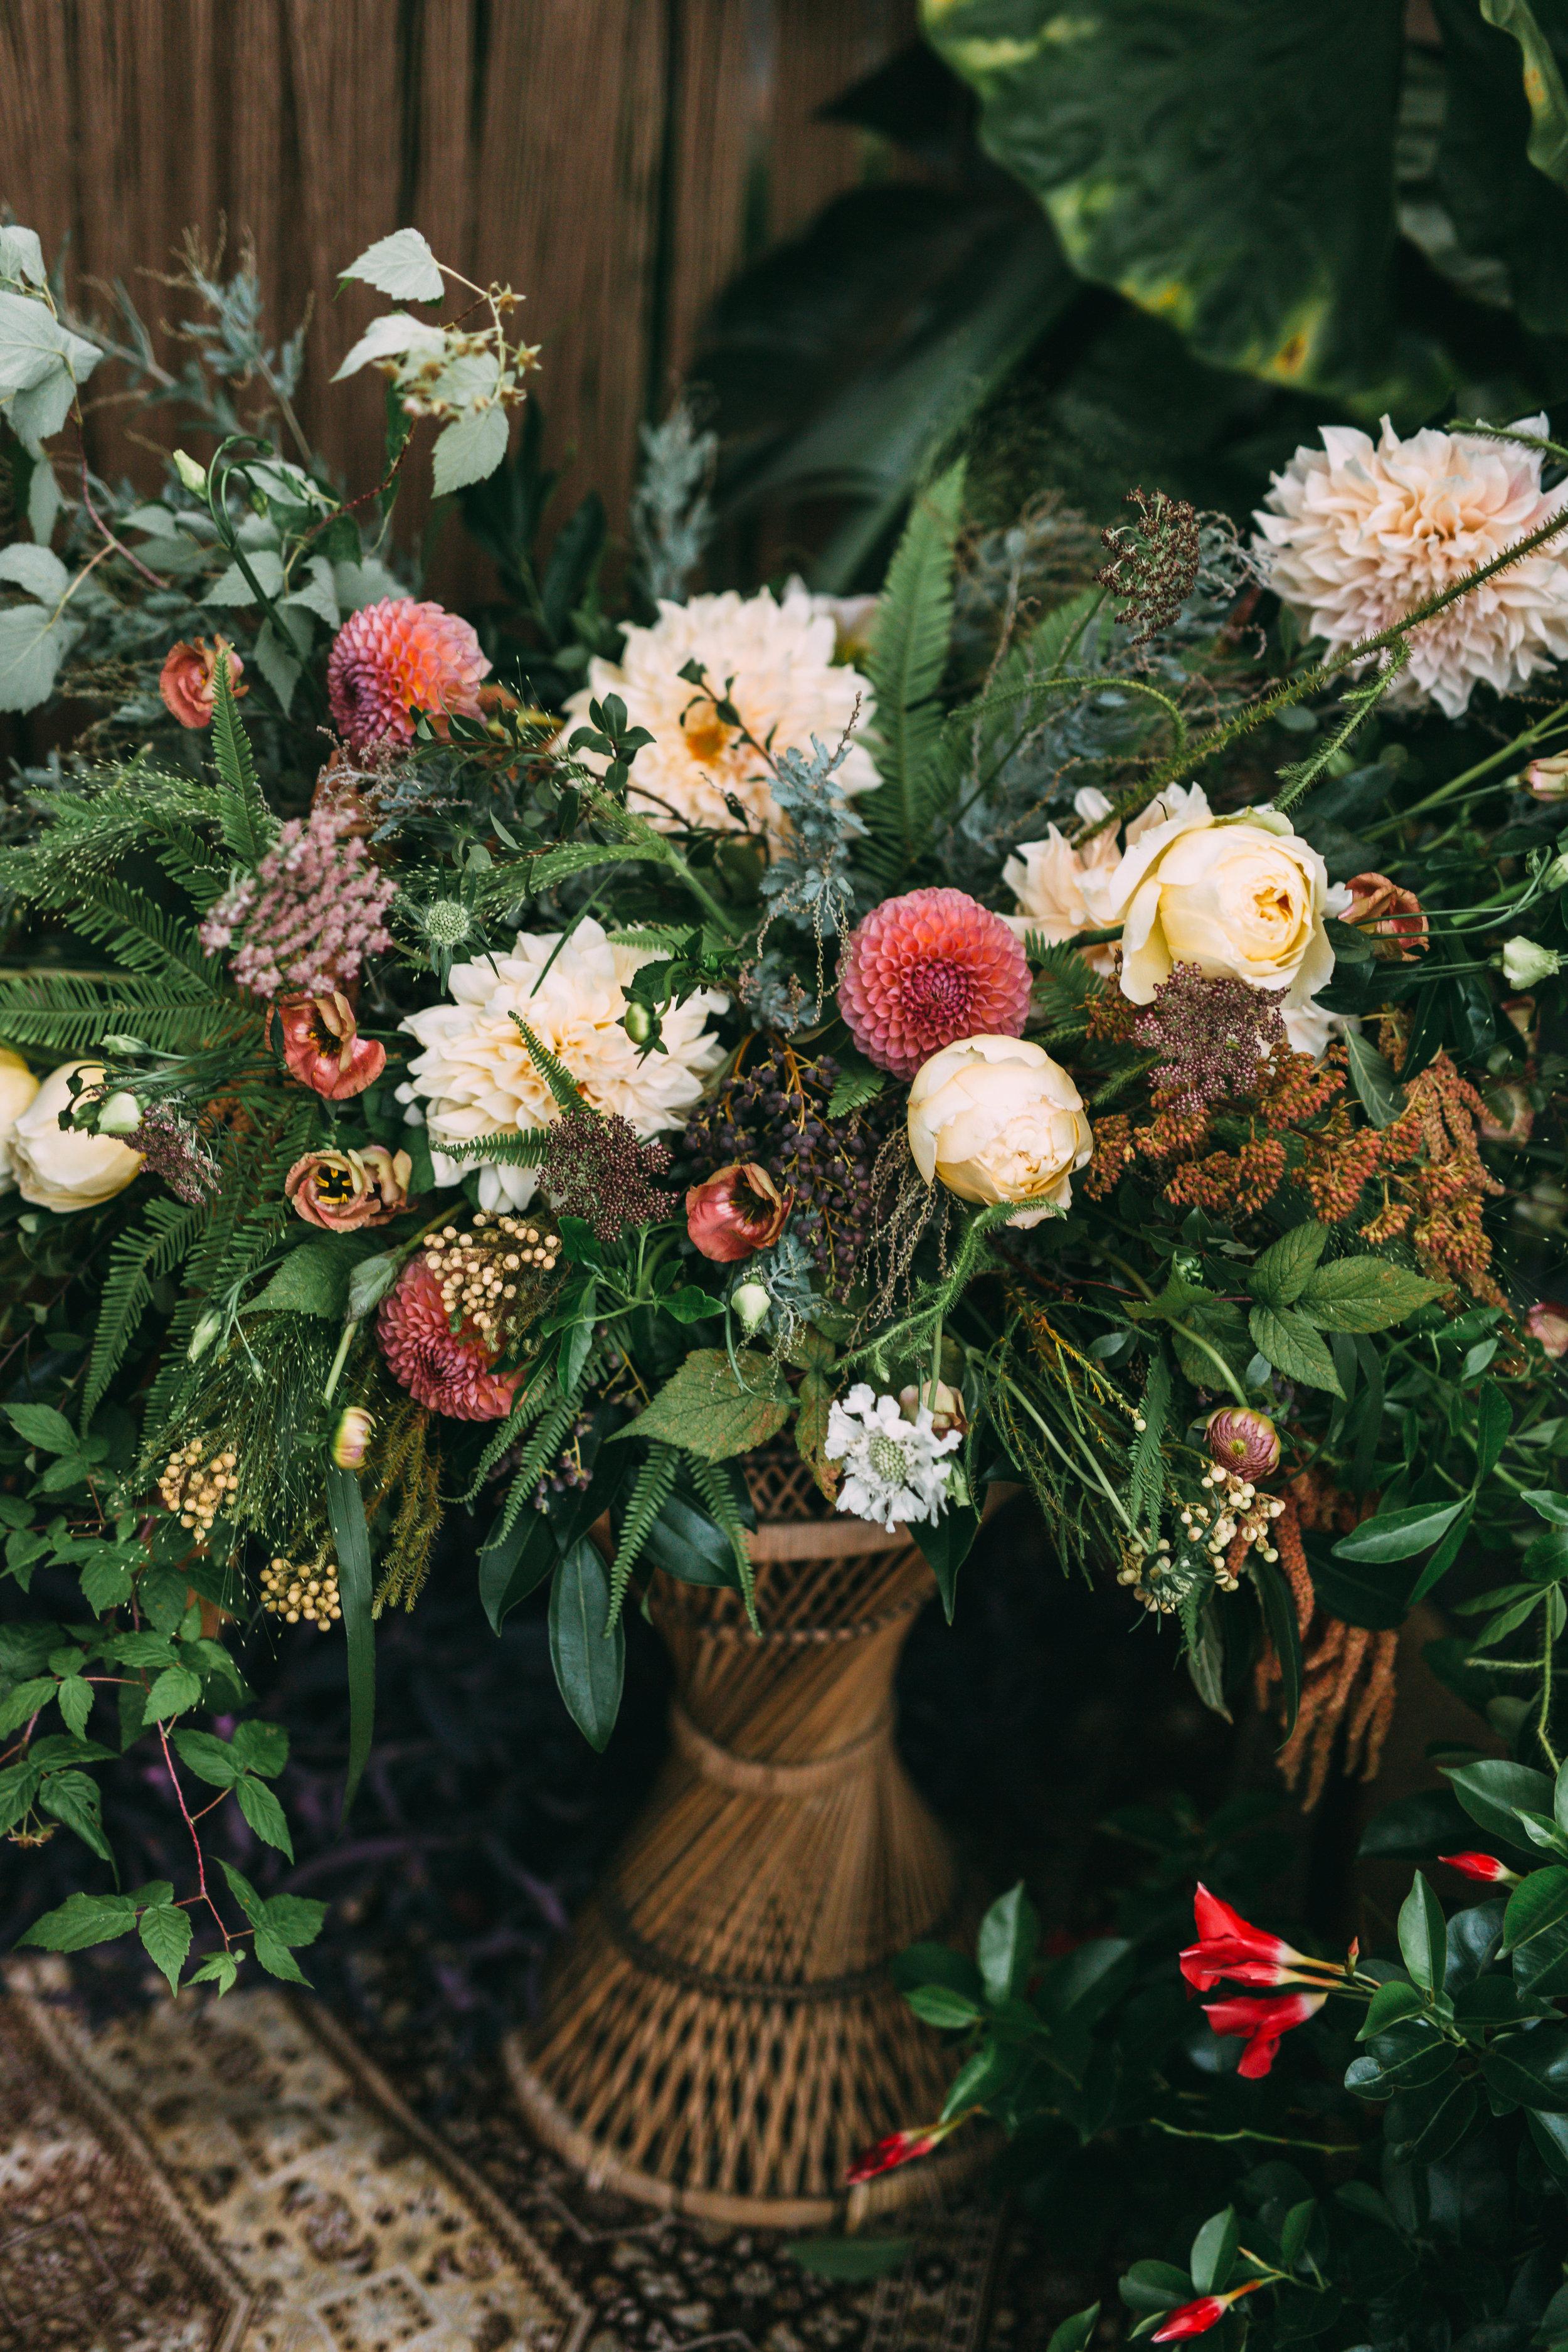 amanda cowley events niagara wedding planner free spirit styling bohemian style floral arrangement wicker